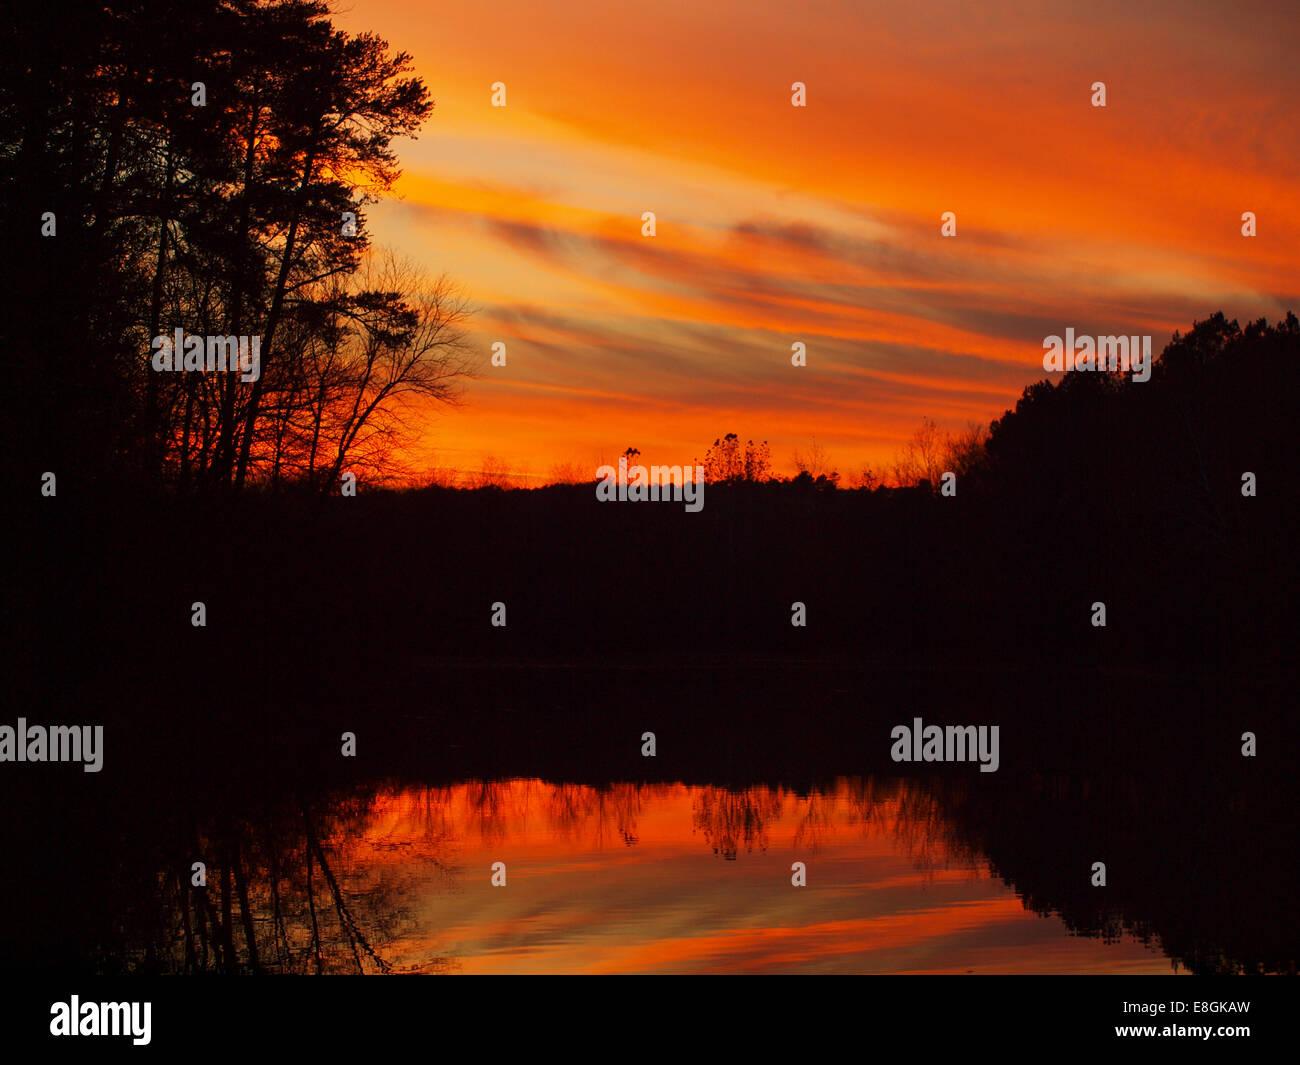 USA, North Carolina, Iredell County, Statesville, Sunset reflection on lake - Stock Image